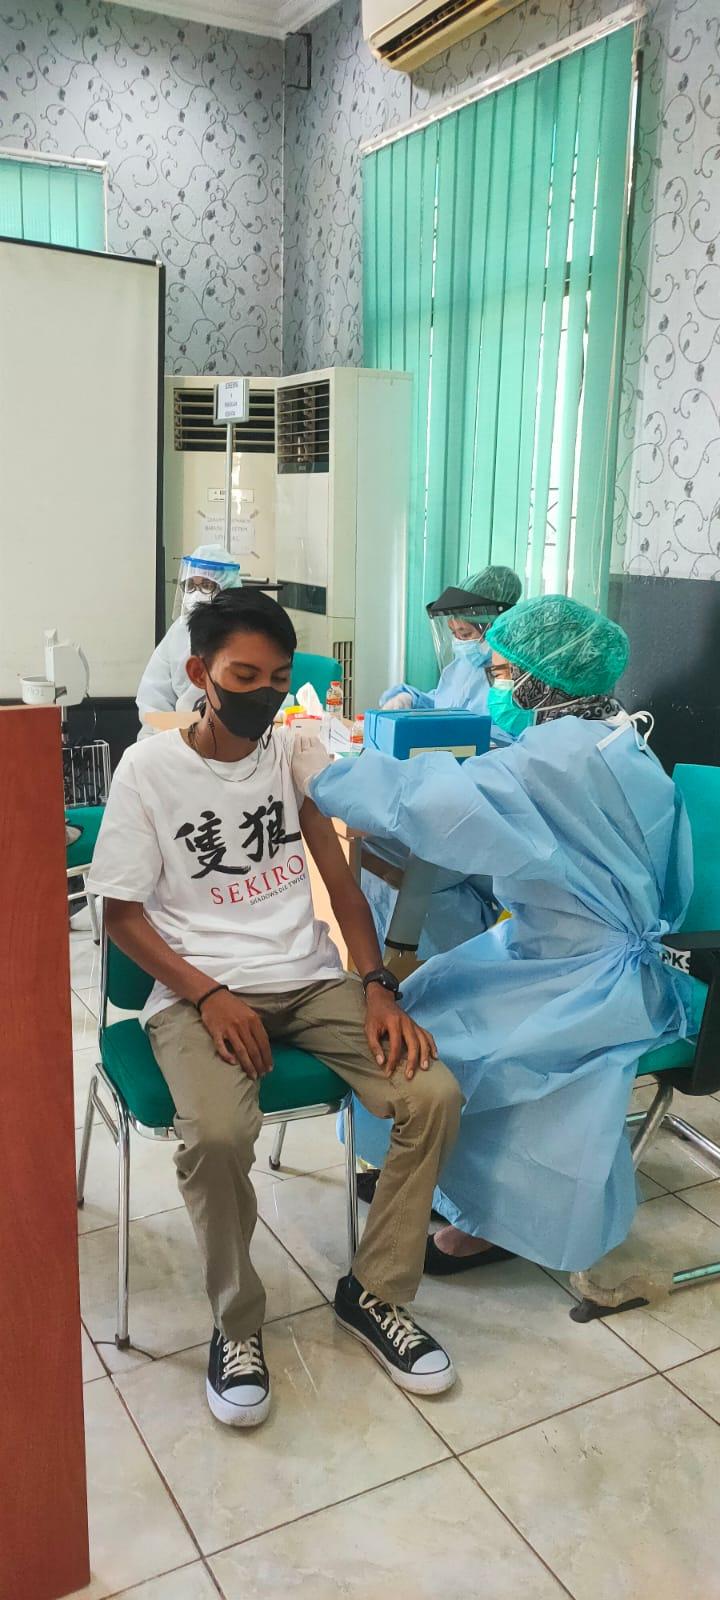 Kegiatan vaksinasi guna mencegah penyebaran COVID-19 di Aula Kecamatan Setu, Tangerang Selatan, Minggu, 18 Juli 2021.